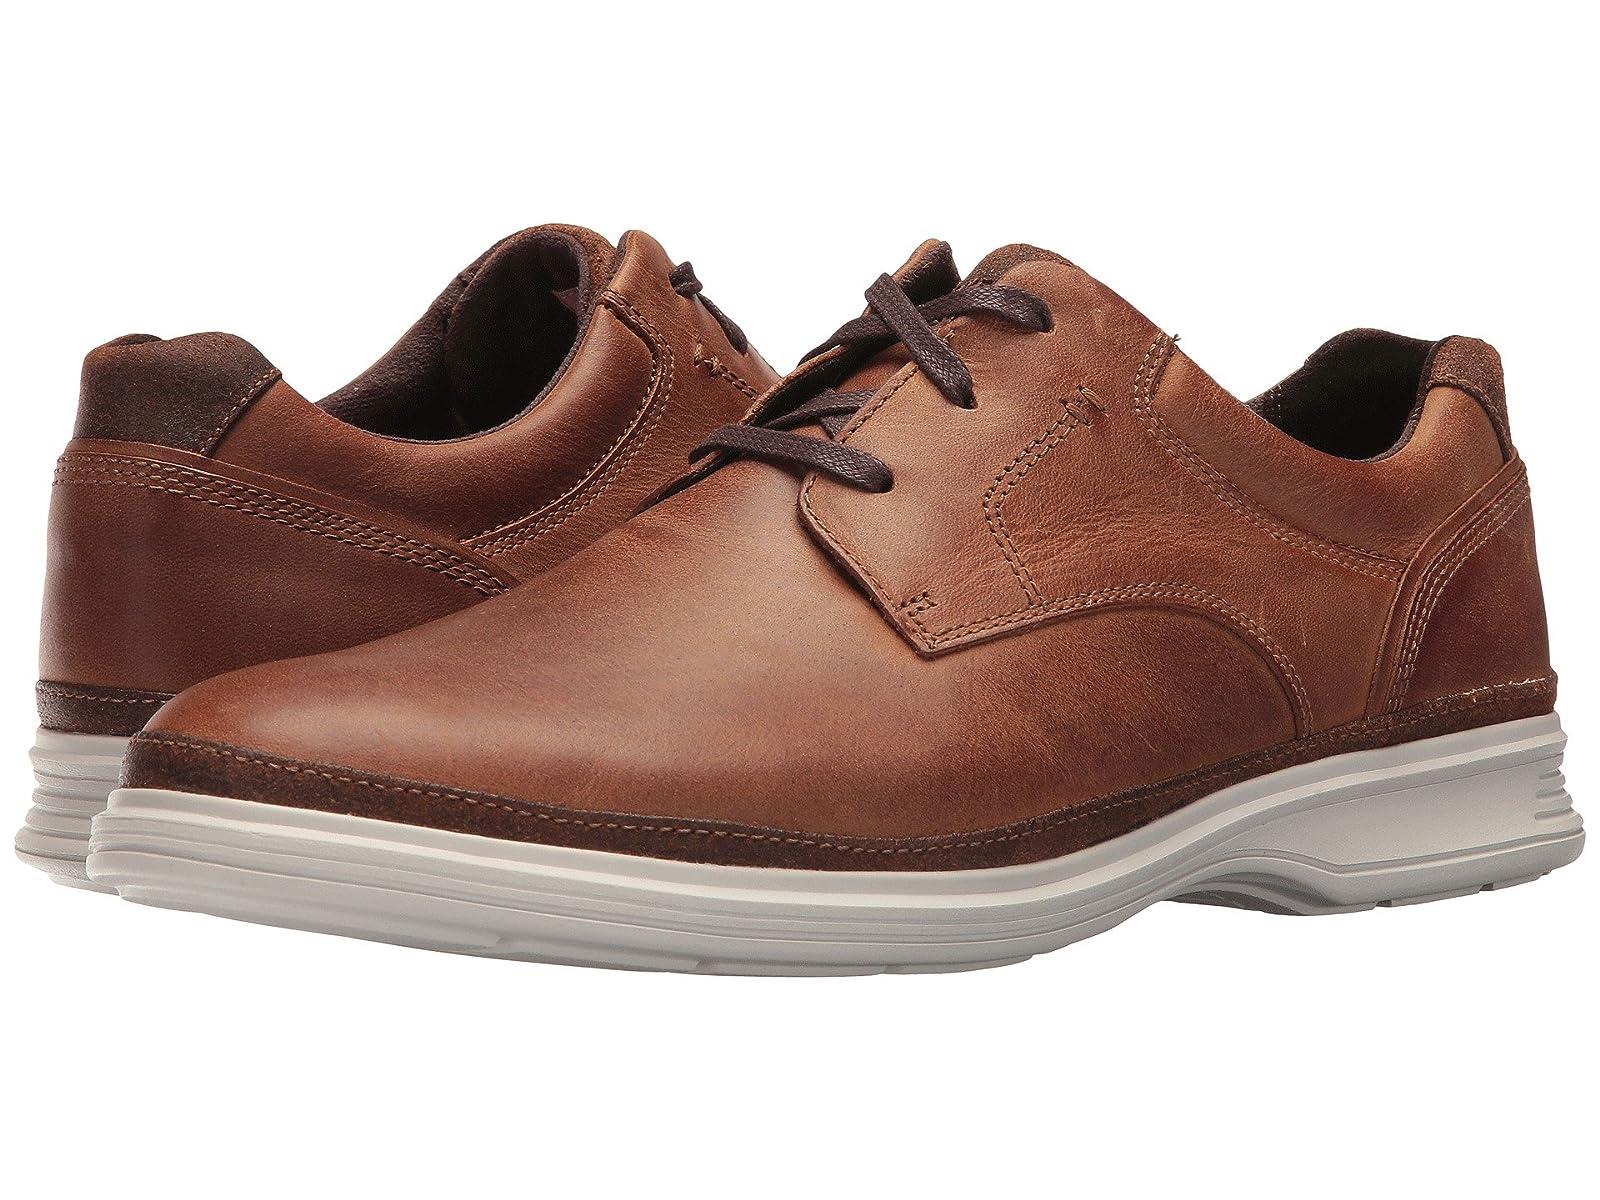 Rockport DresSports 2 Go Plain ToeAtmospheric grades have affordable shoes